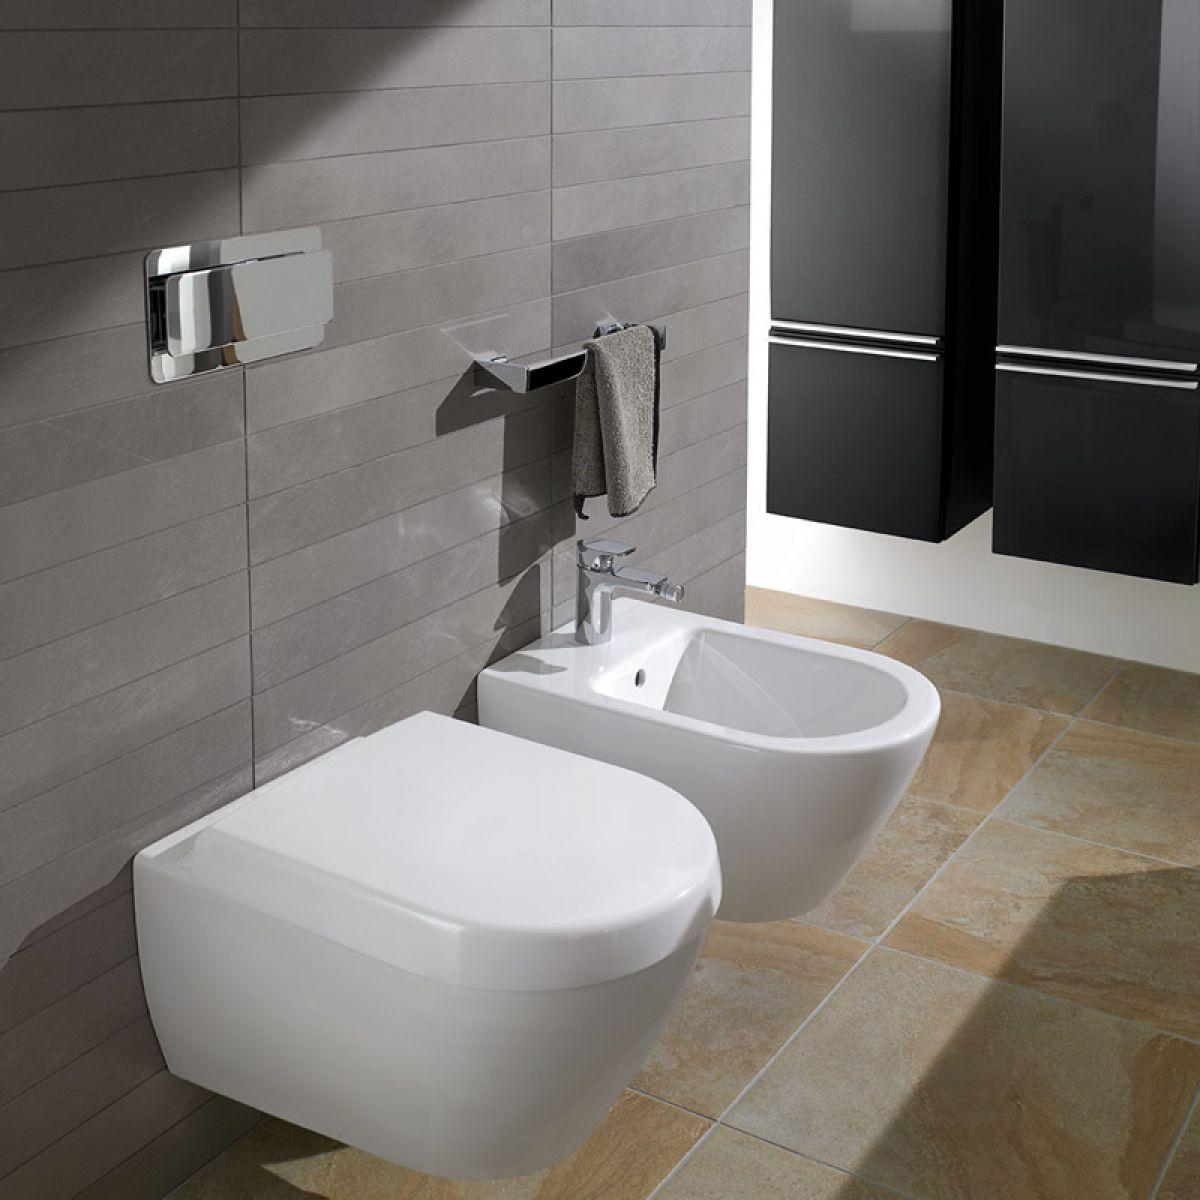 Bathroom Tiles Villeroy Boch villeroy & boch bernina tiles 2394 (30 x 60cm) : uk bathrooms